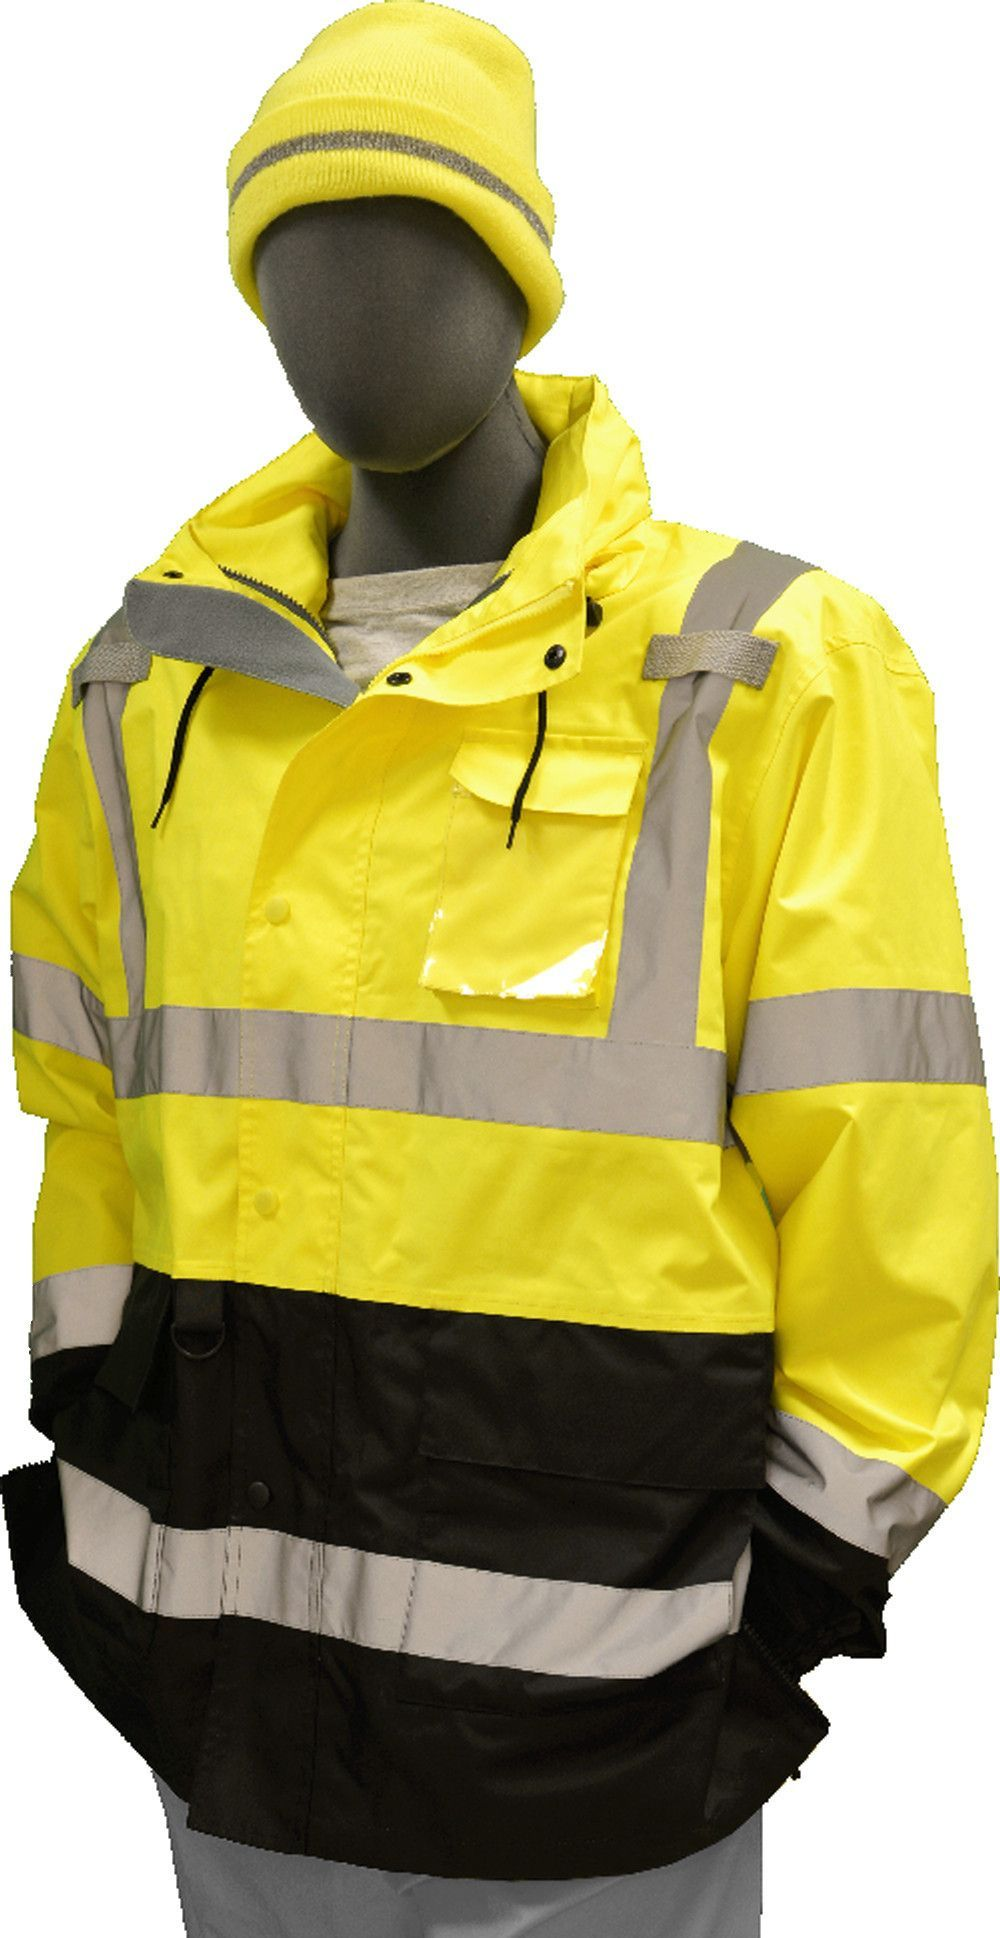 Safety Jacket Majestic 751307 CL3 Hi Vis Yellow Parka